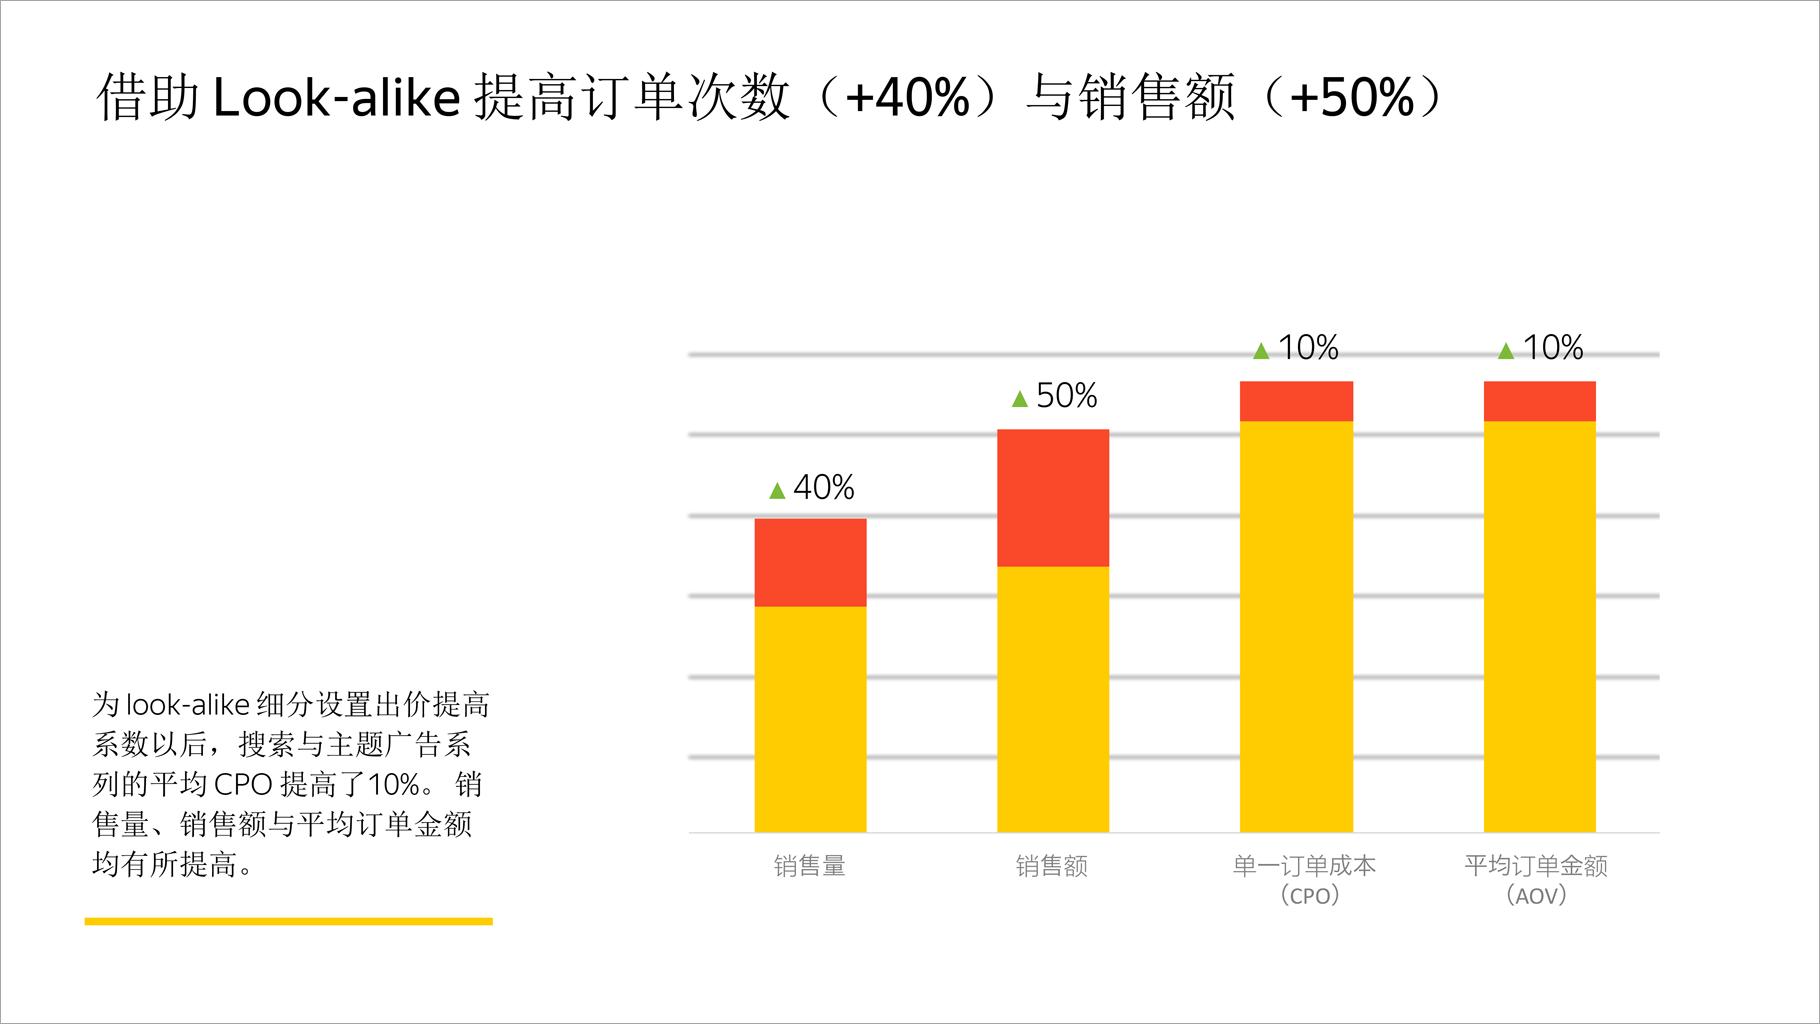 借助 Look-alike 提高订单次数(+40%)与销售额(+50%)